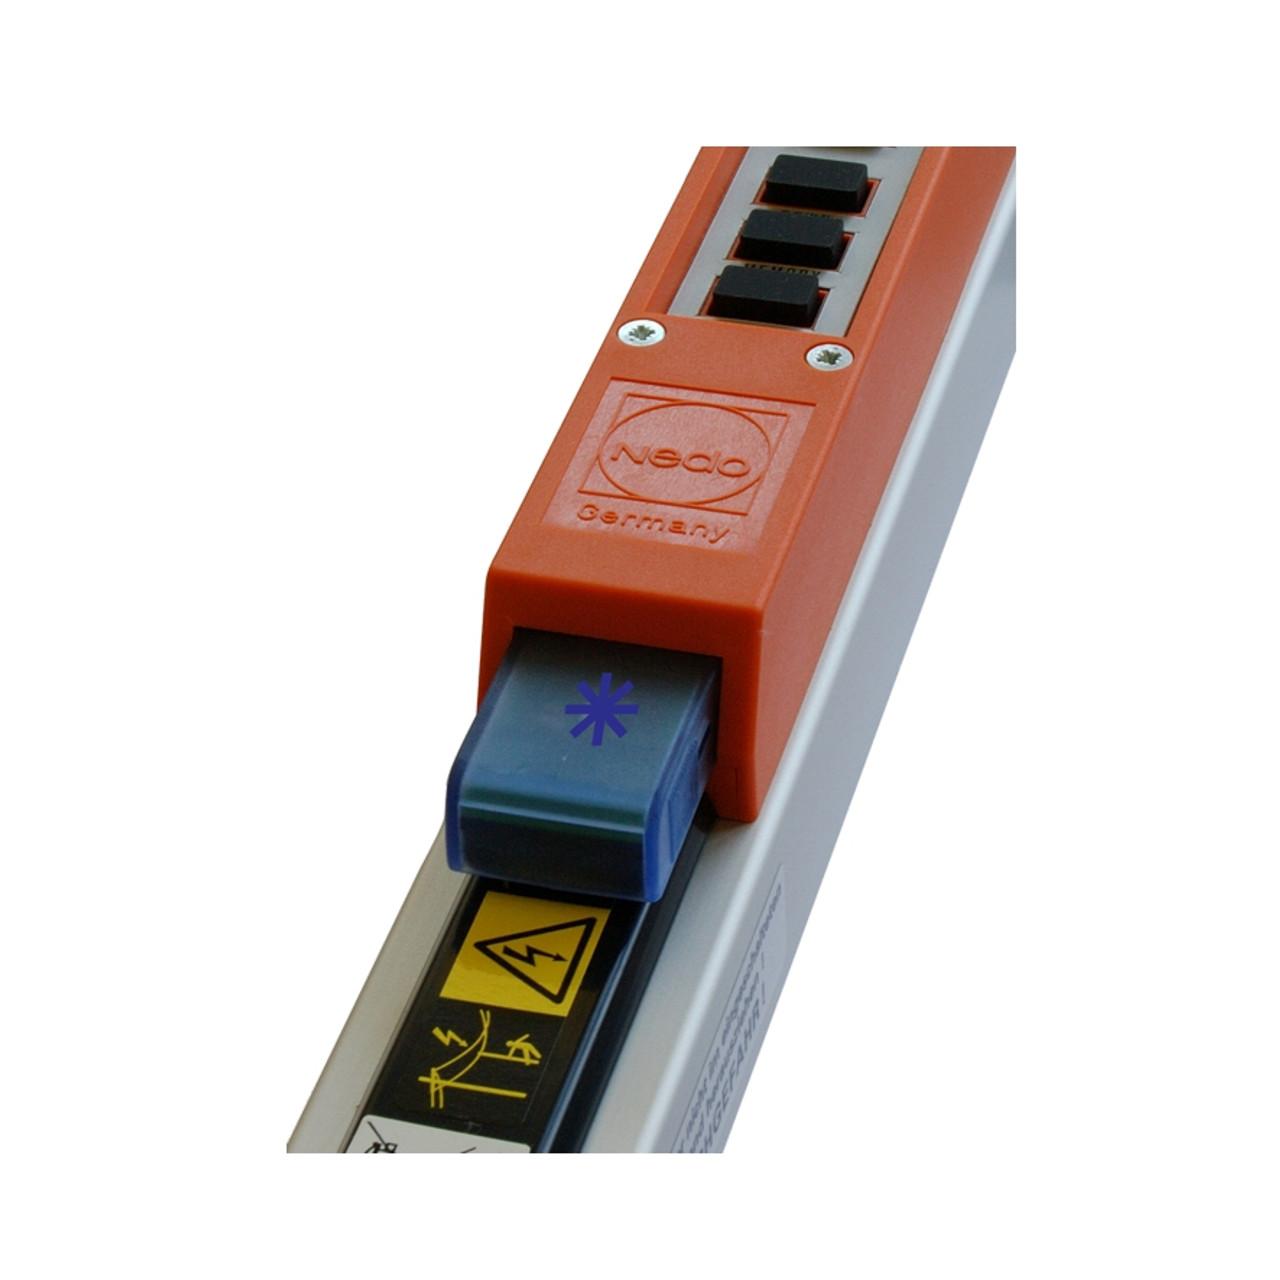 Nedo Bluetooth module Blue Connect Messtronic (585228)